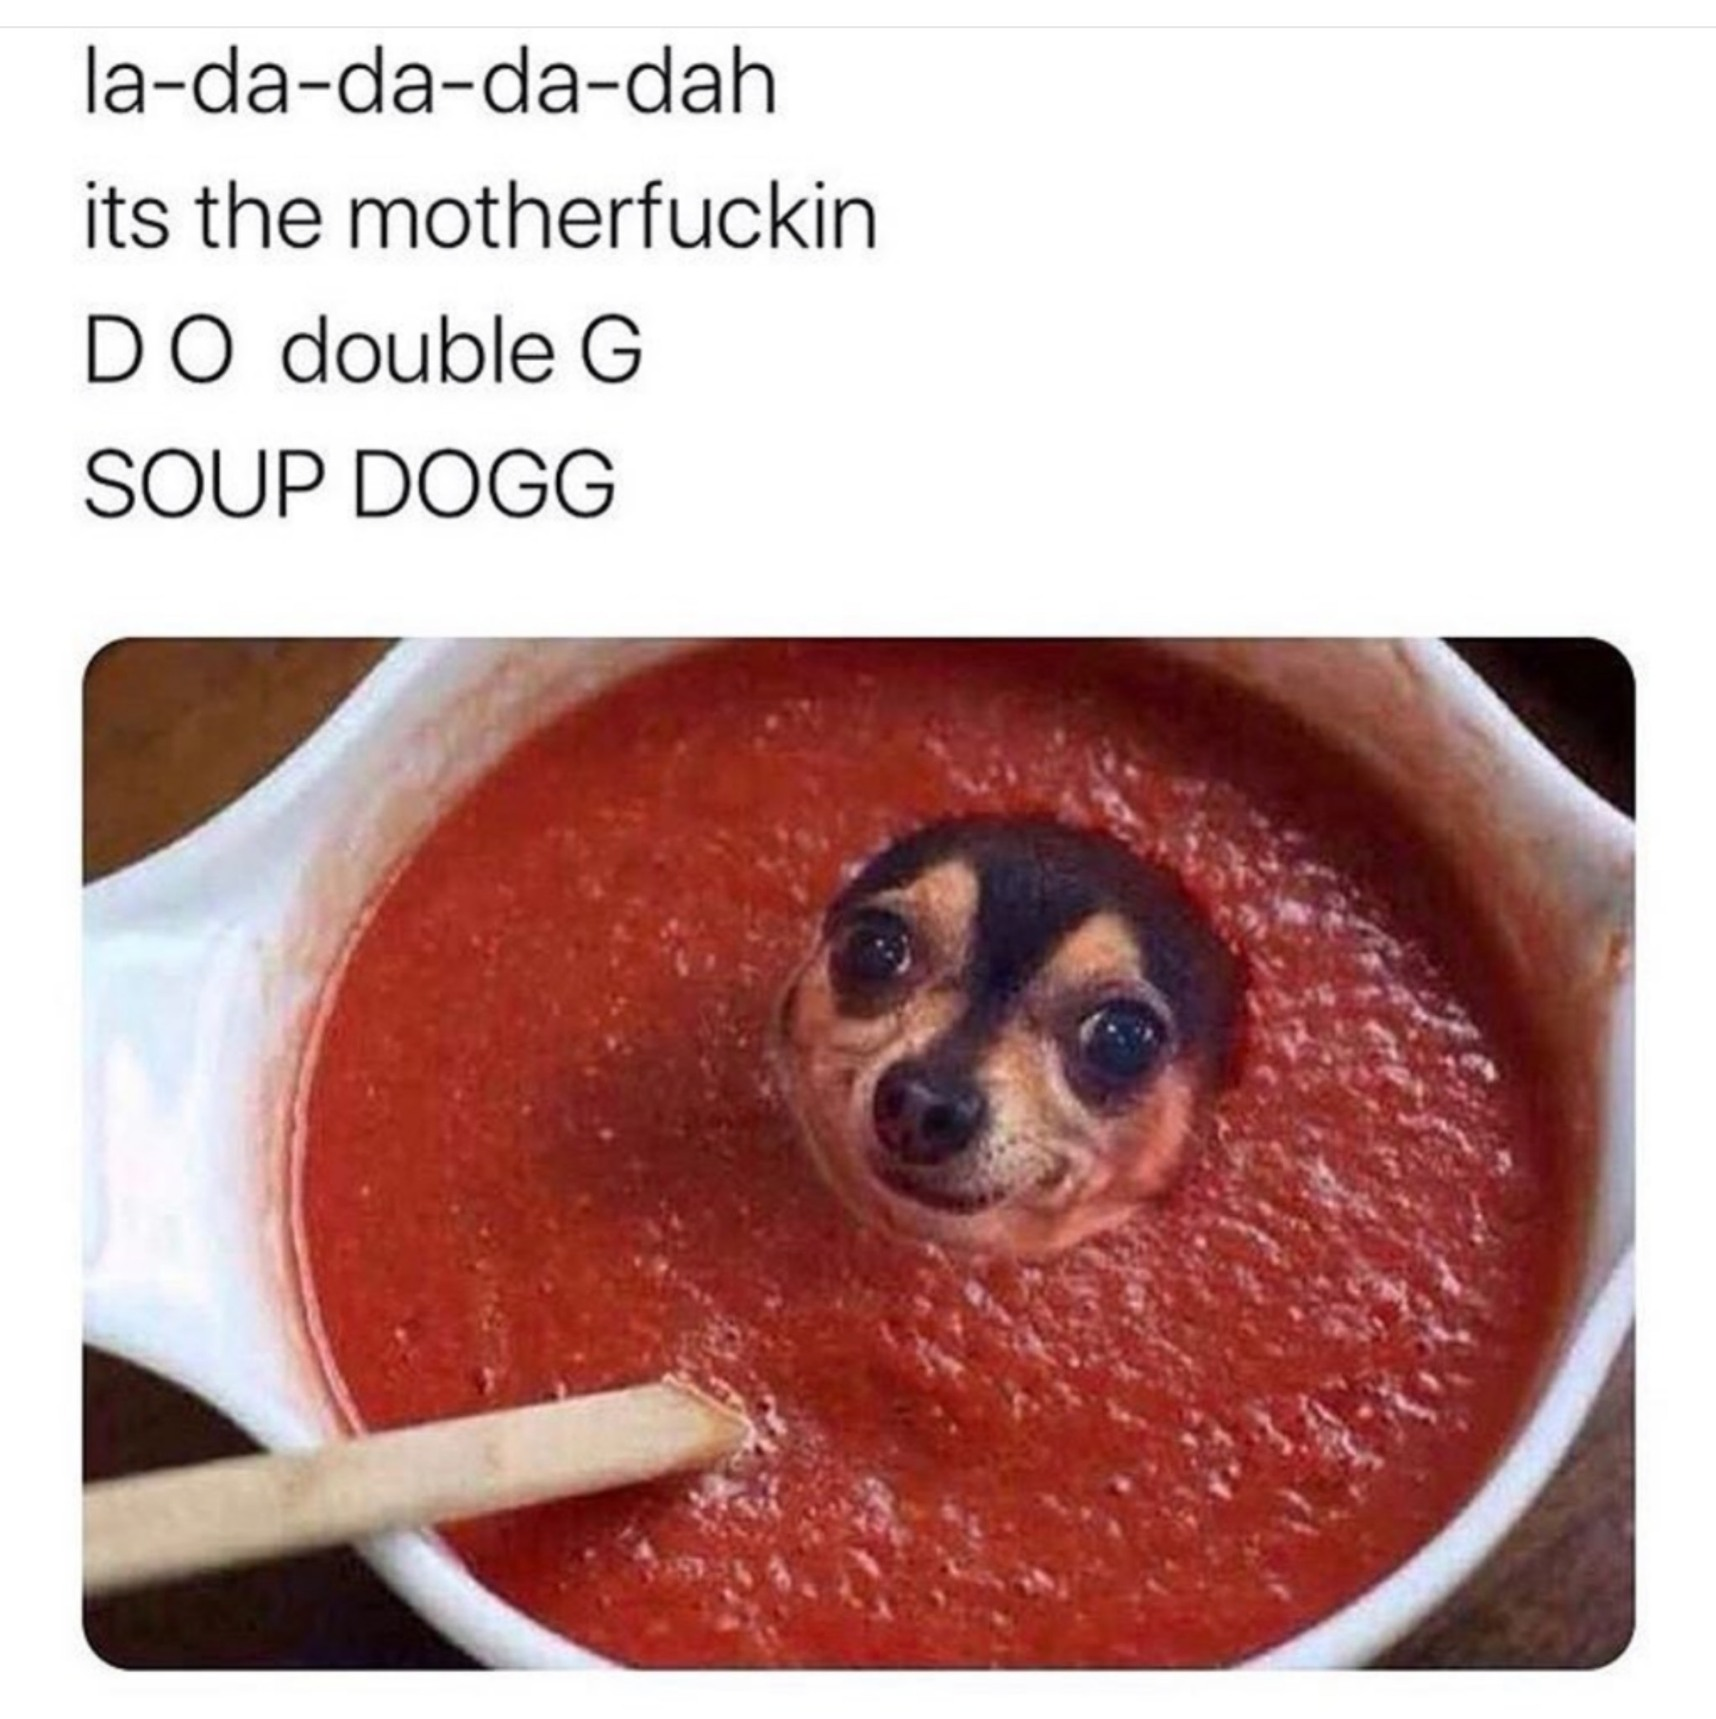 Soup dog mother FUCKER - meme